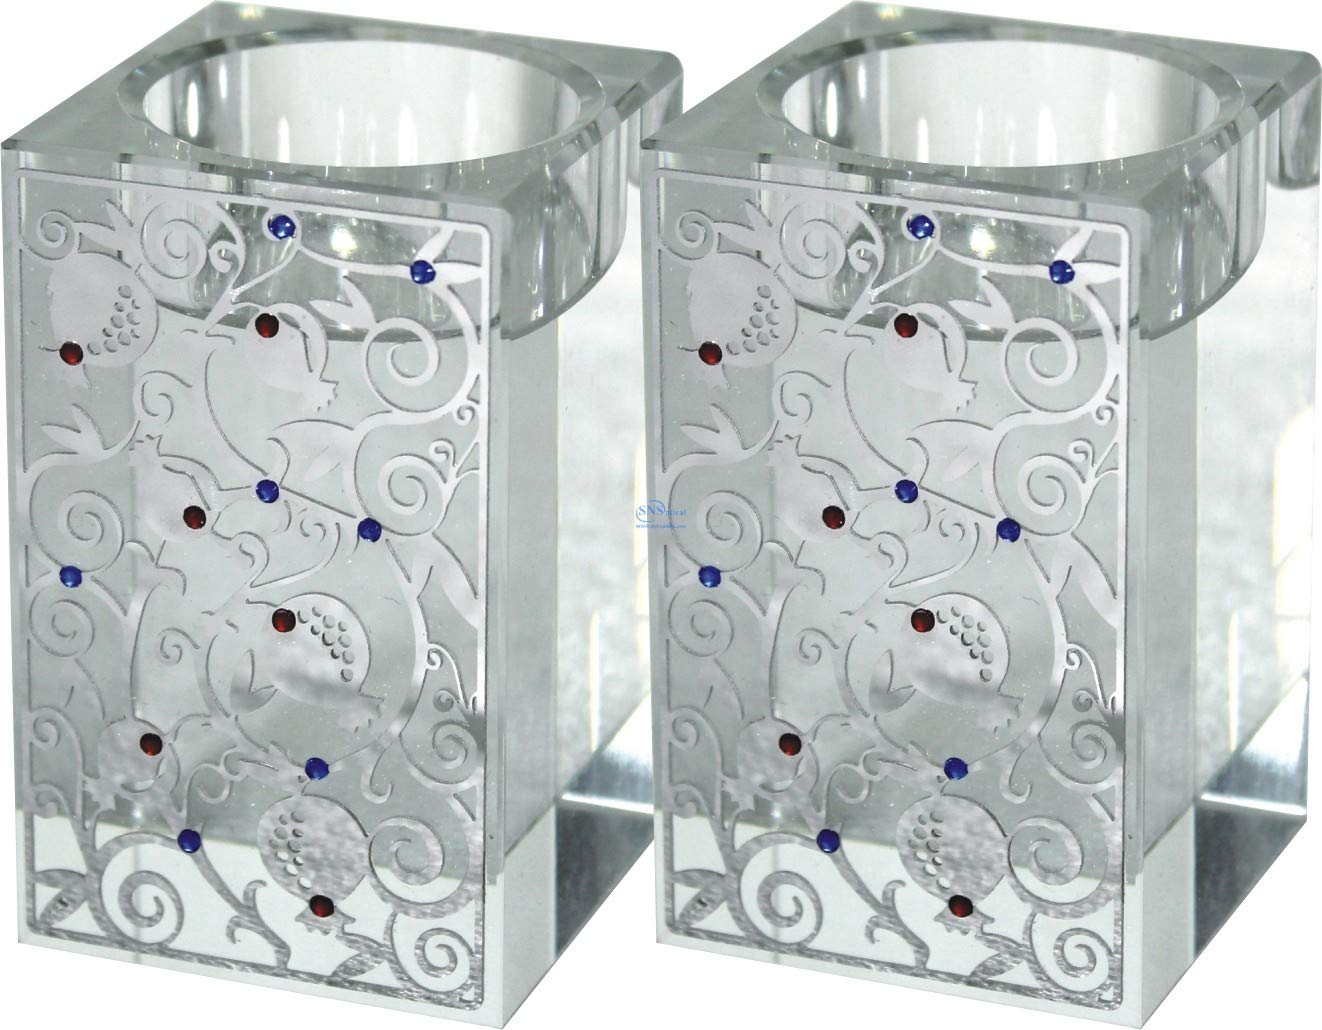 SNSArts /& Judaica Beautiful Square Crystal Candlesticks 8cm with Metal Plaque-Pomegranate SNS-UK57883